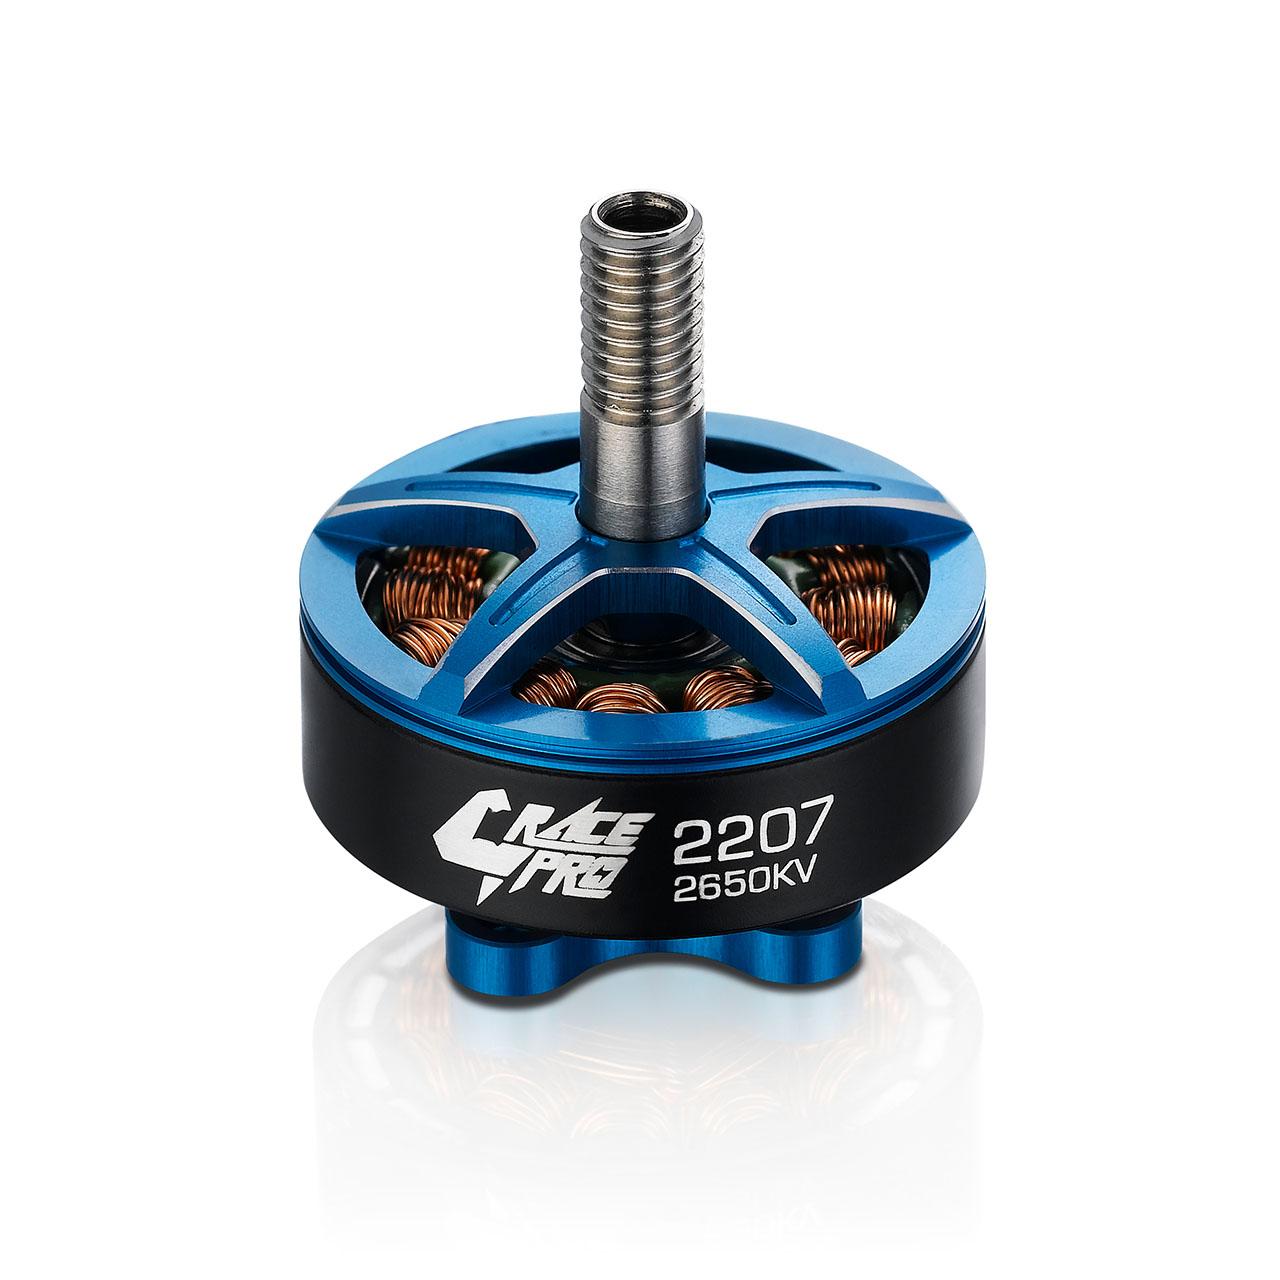 Moteur Hobbywing XRotor 2207-2650KV RACE PRO BLUE